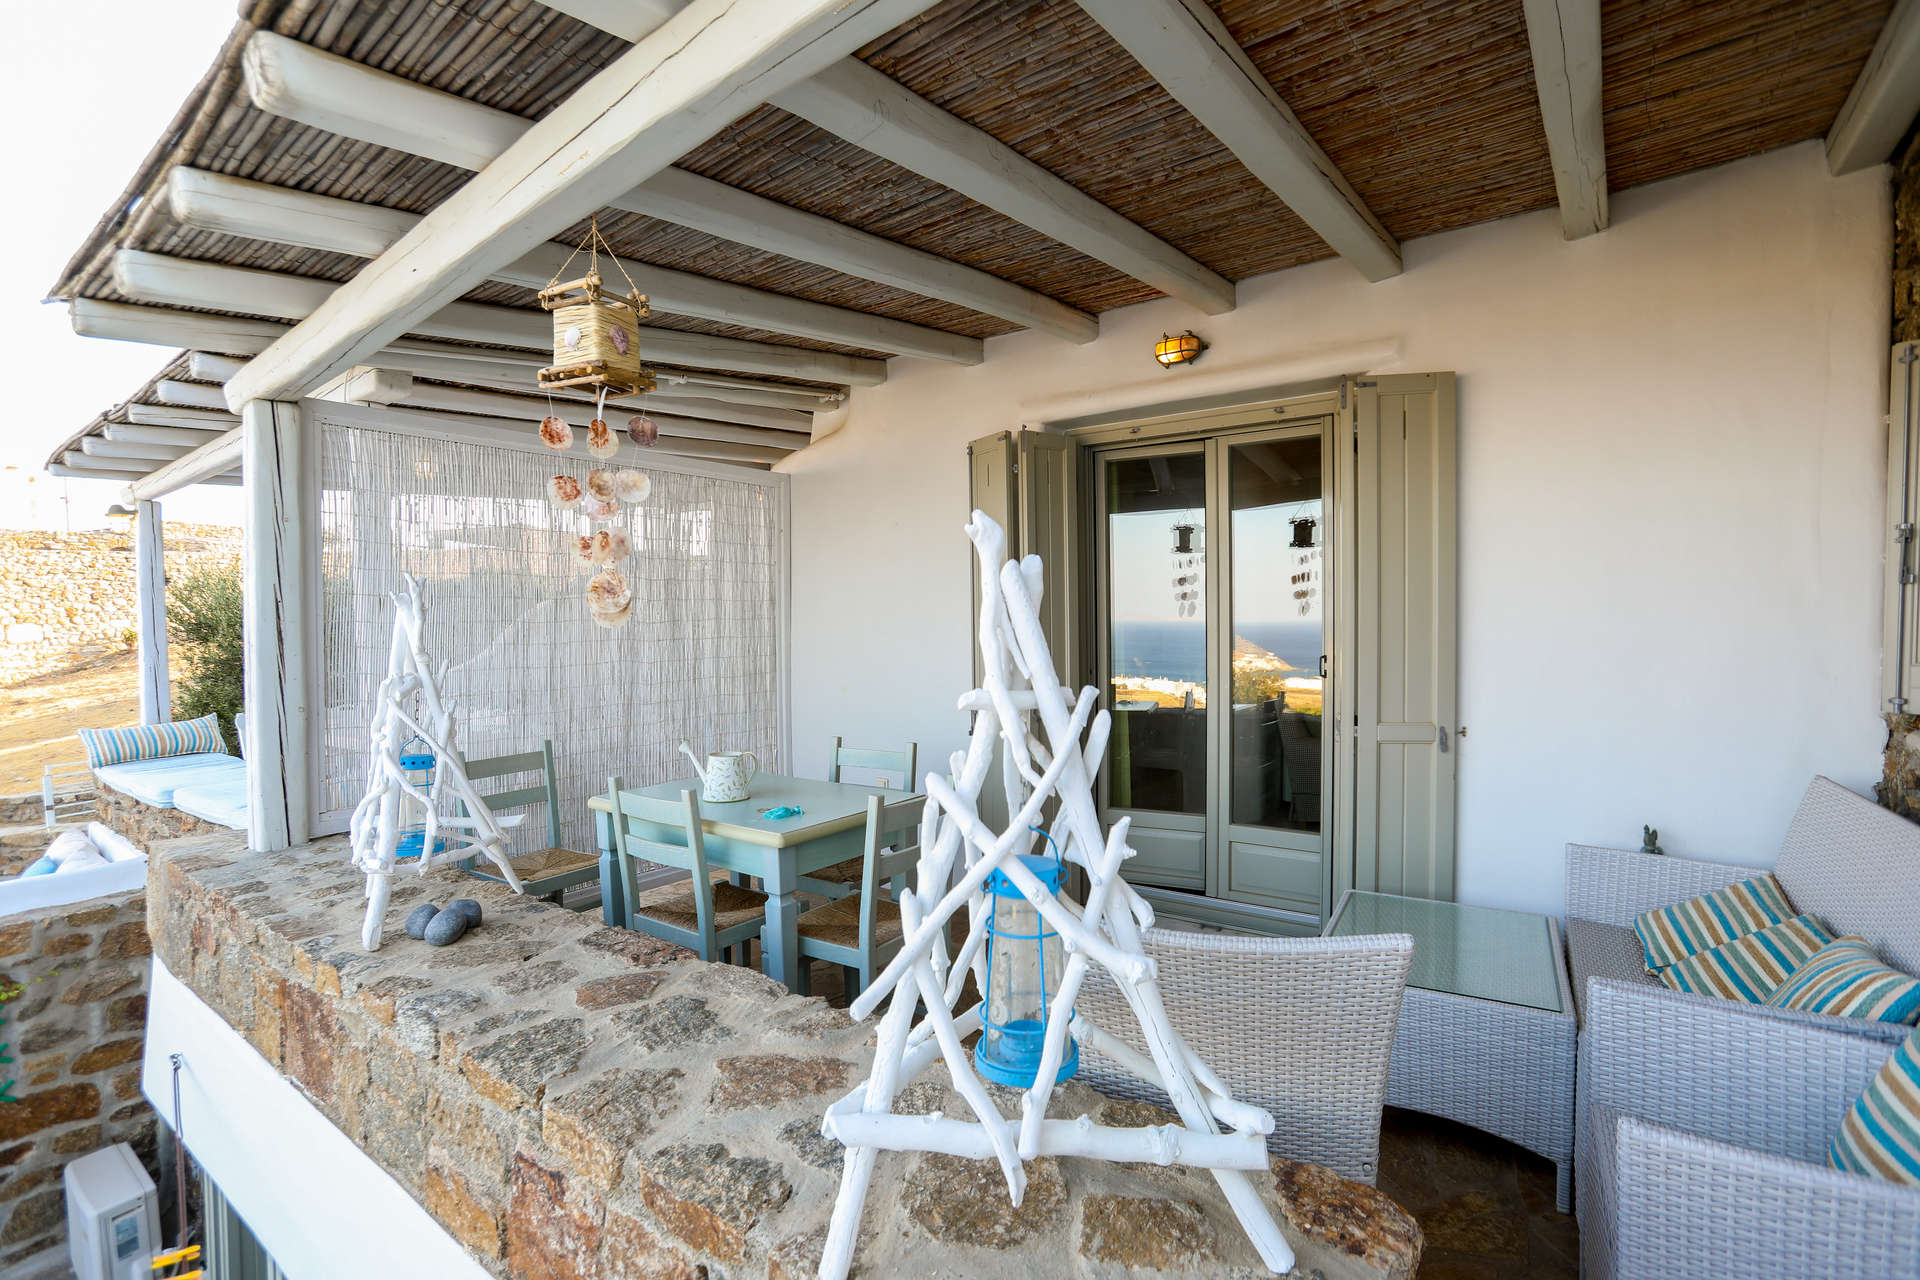 Luxury vacation rentals europe - Greece - Mykonos - Kalafatis - Avra House - Image 1/14